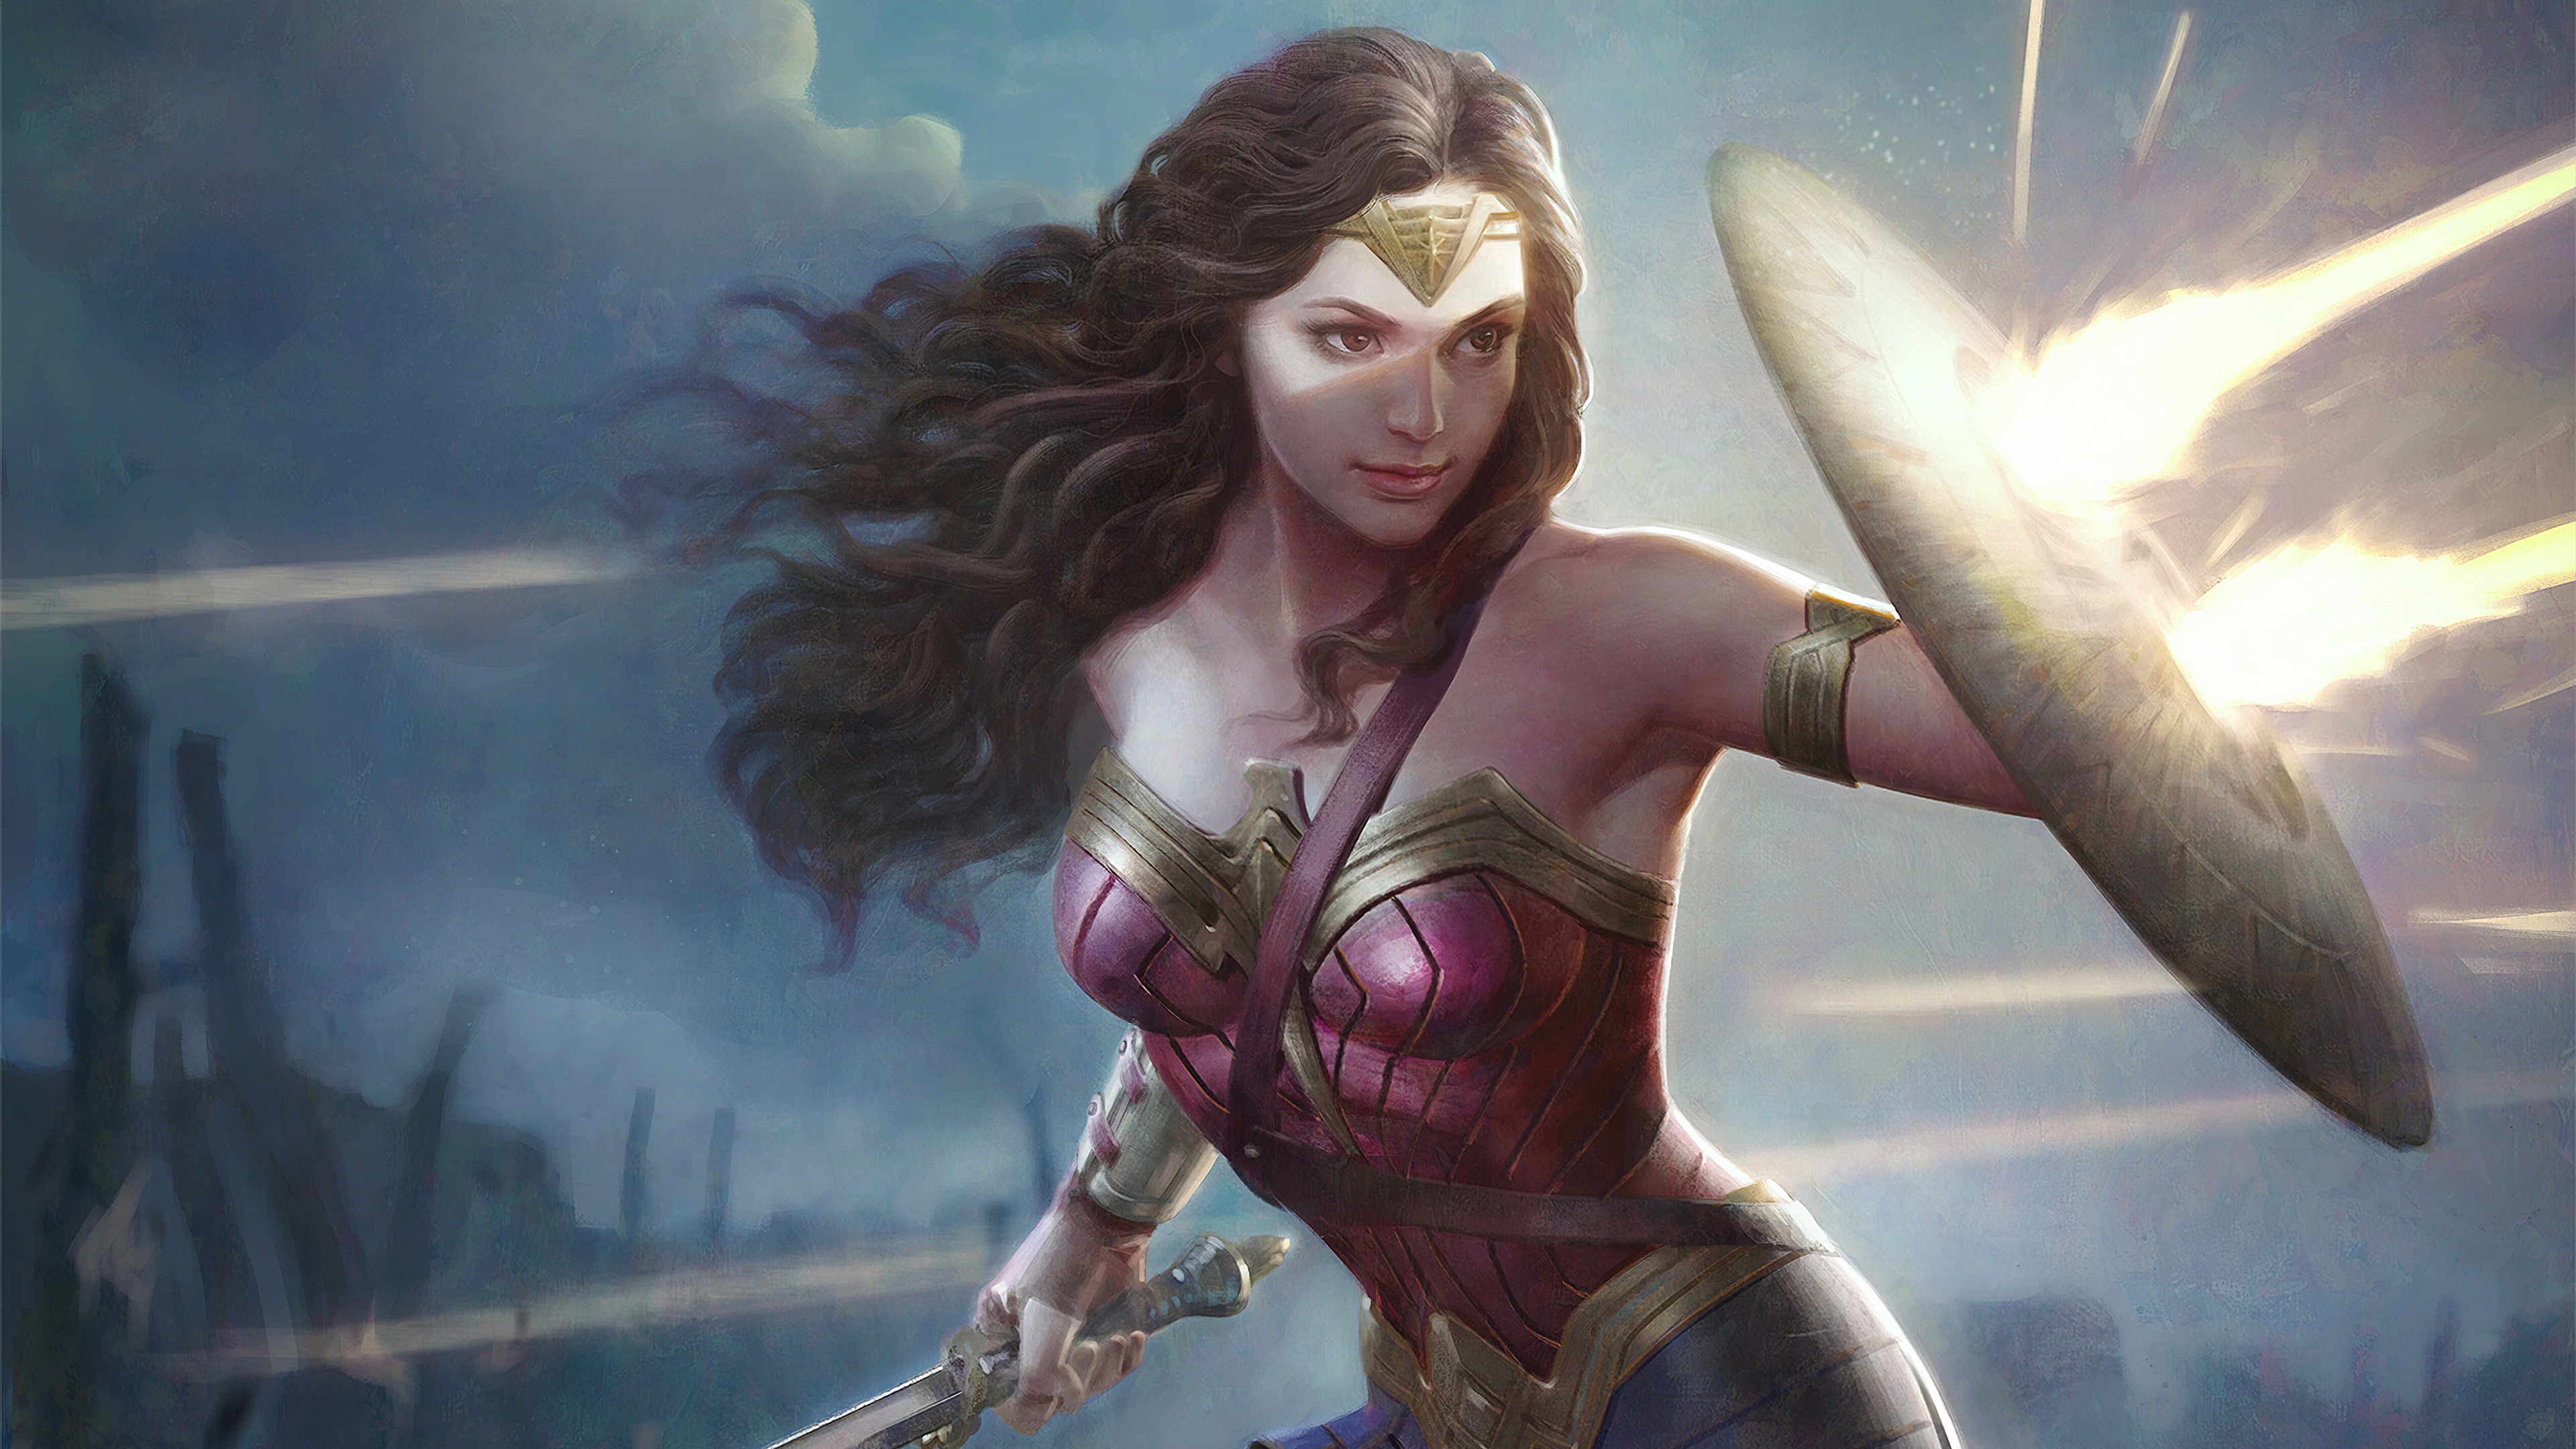 wonder woman shieldart 1572368694 - Wonder Woman Shieldart - wonder woman wallpapers, superheroes wallpapers, hd-wallpapers, deviantart wallpapers, artwork wallpapers, artist wallpapers, 4k-wallpapers